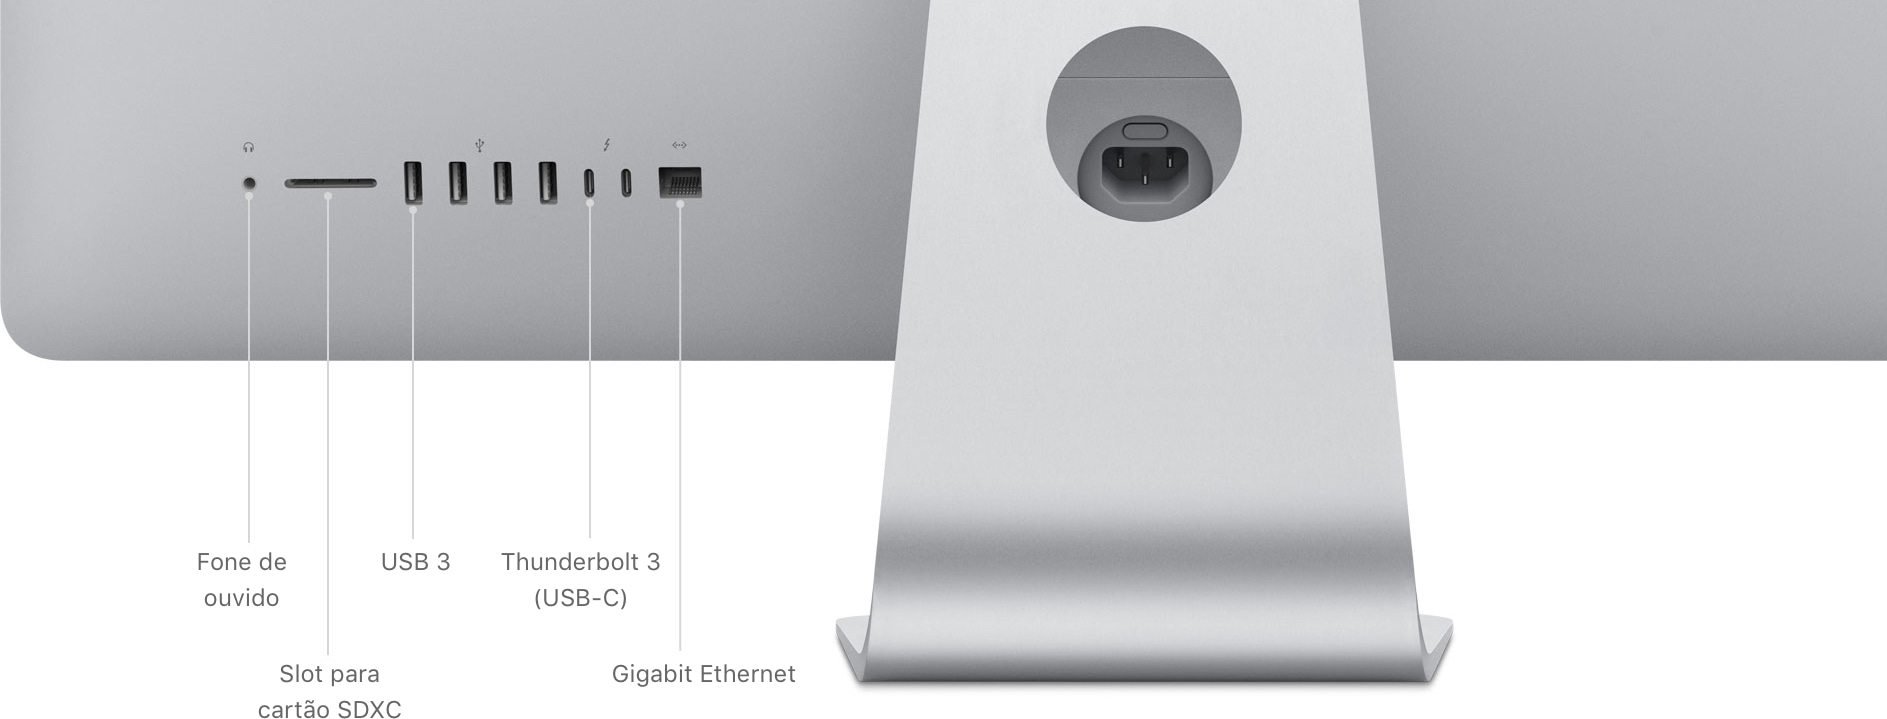 Conectividade do iMac